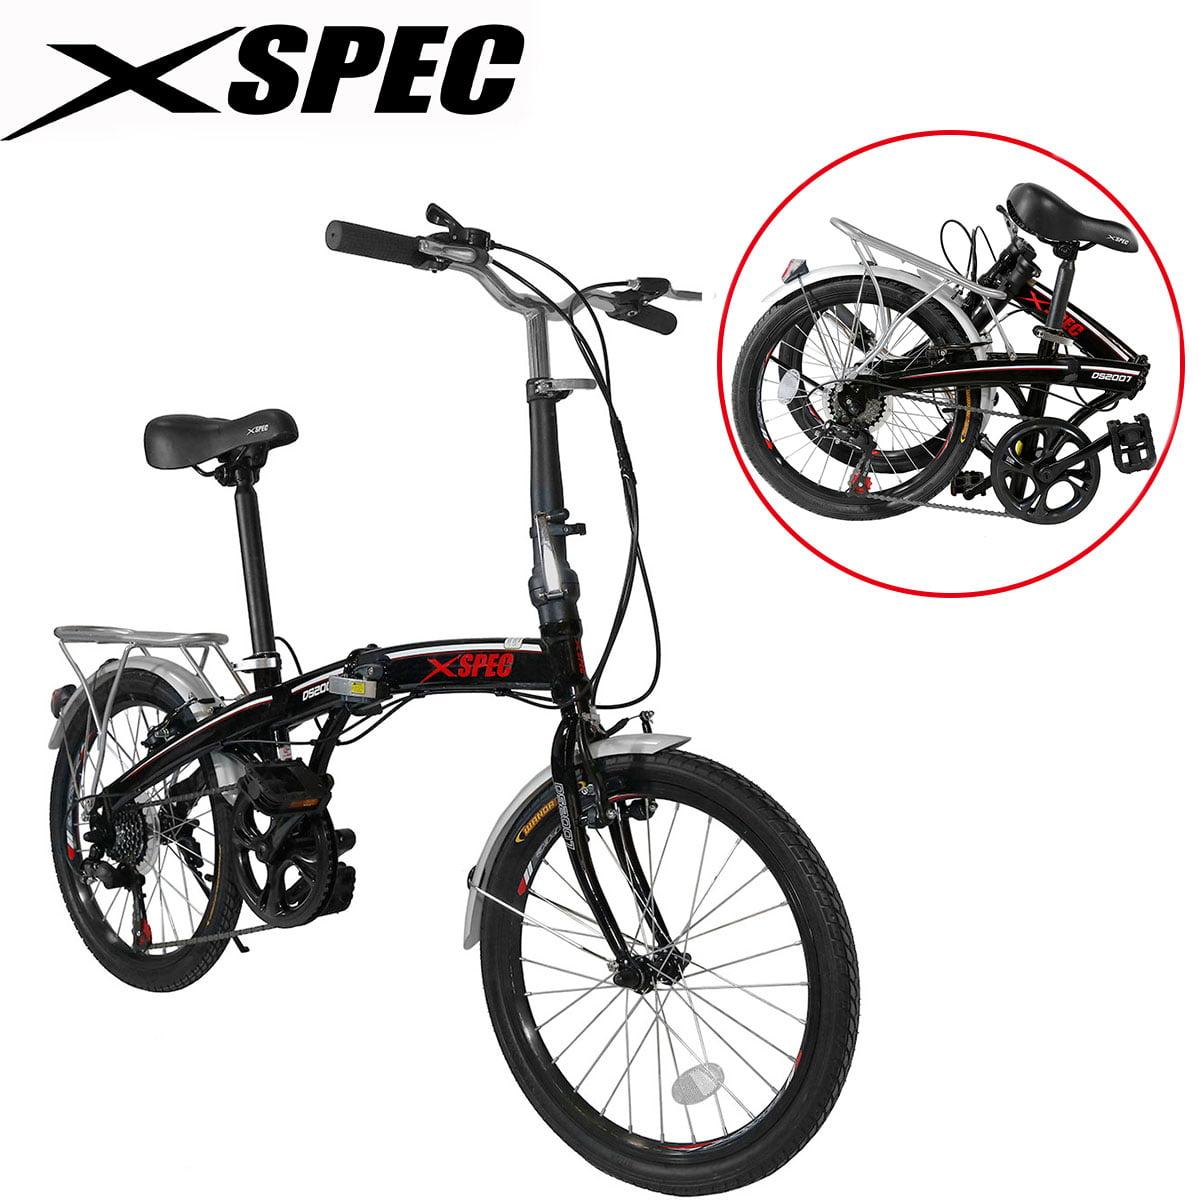 "Xspec 20"" 7 Speed City Folding Mini Compact Bike Bicycle Urban Commuter Shimano Black"